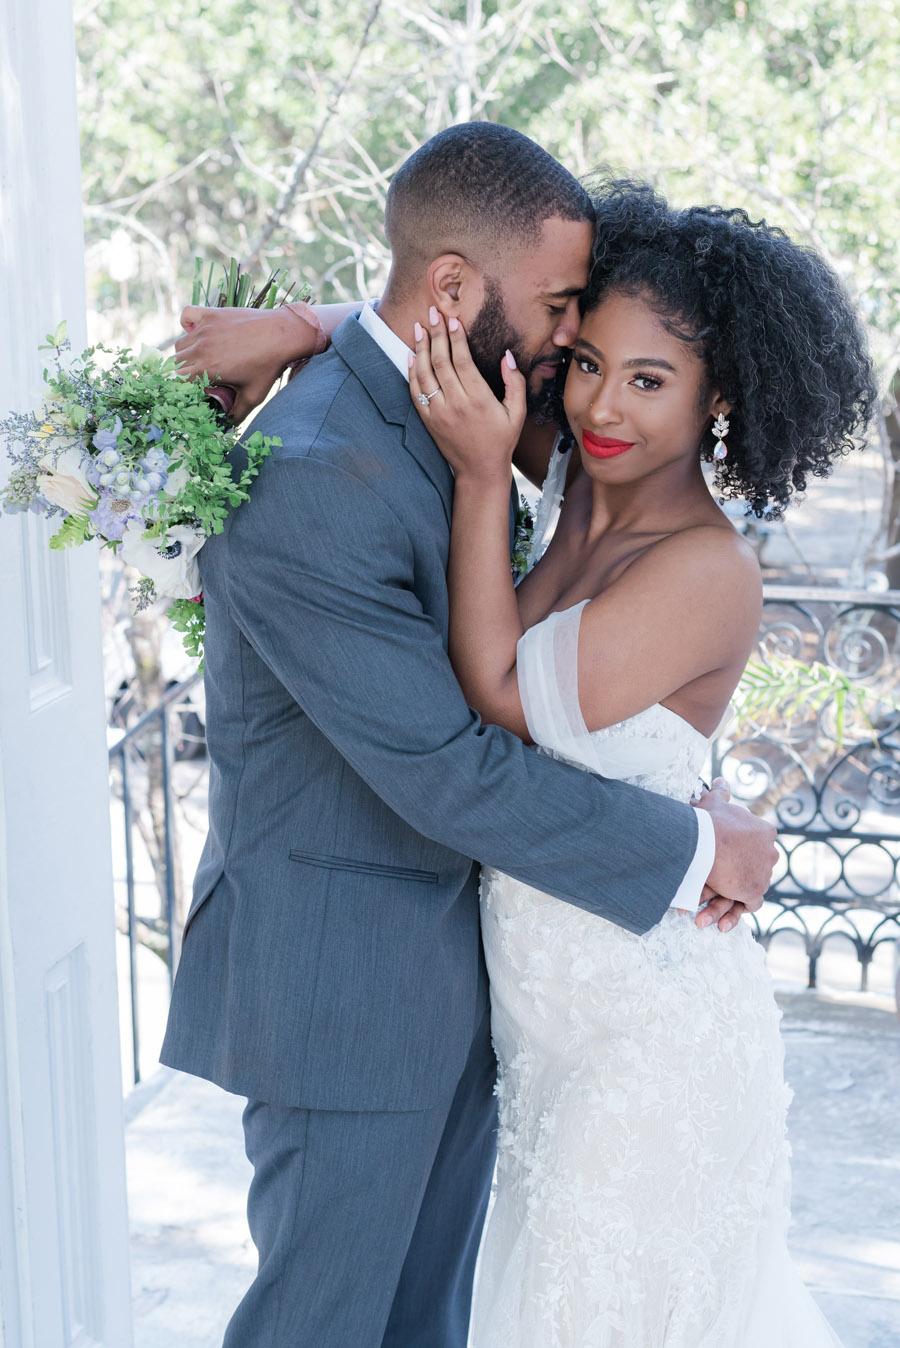 Luxury editorial garden wedding, image credit Leigh Hayward Photography (14)